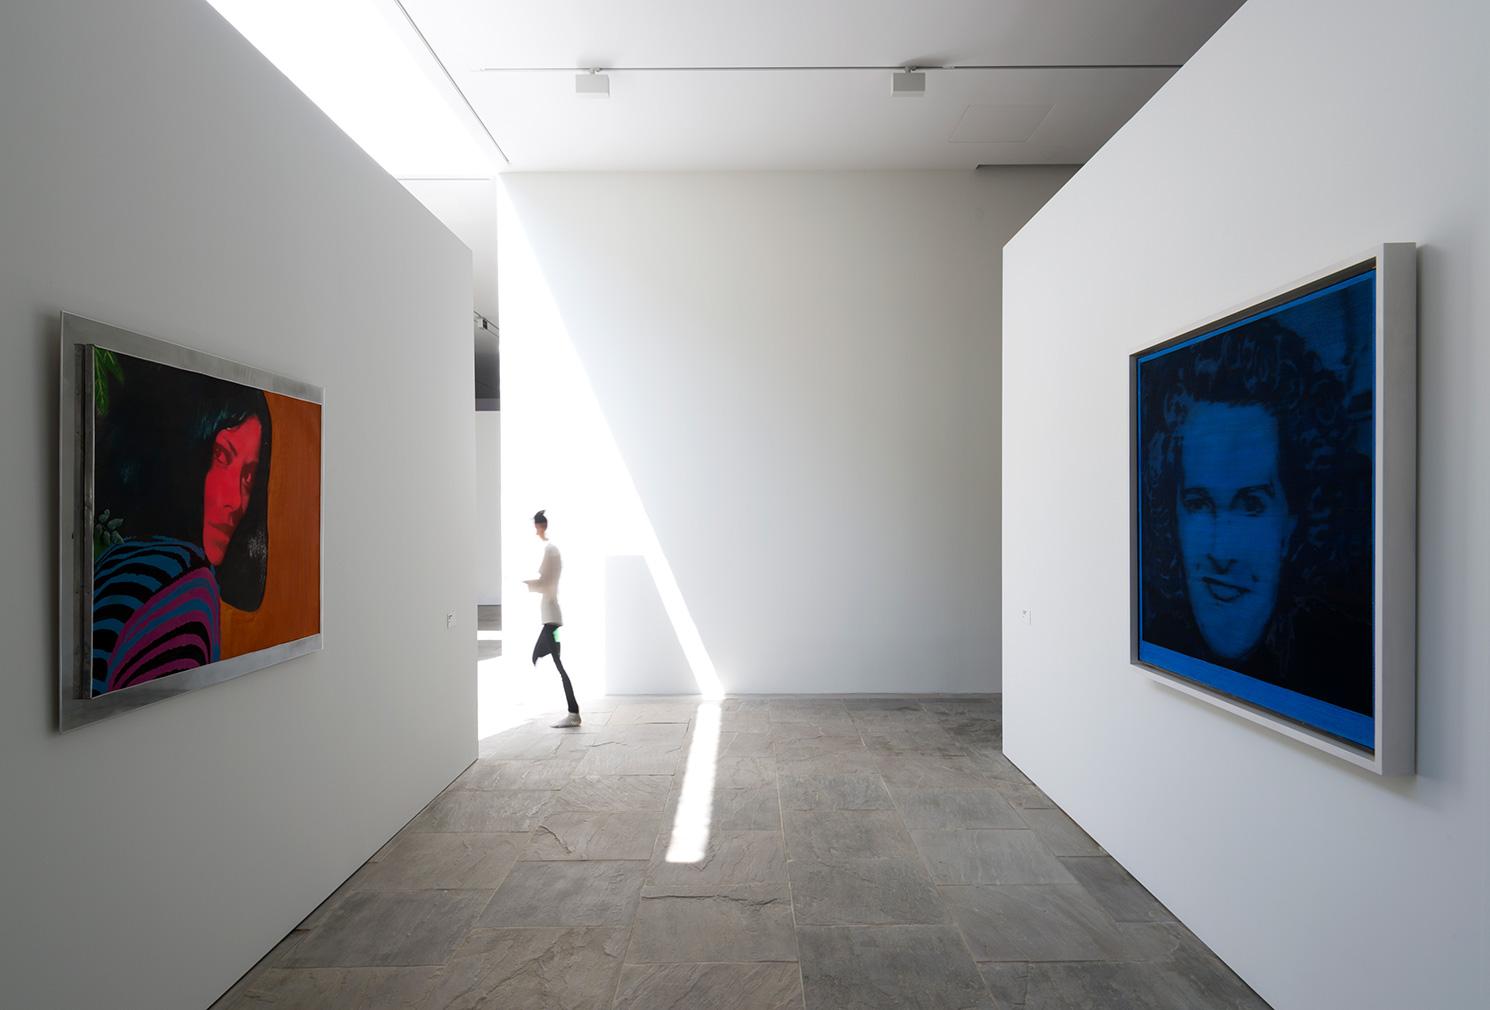 Left to right: Martial Raysse, 'Untitled', 1962. © Adagp, Paris 2018; Gerhard Richter, 'Evelyn (Blau)', 1964. © Gerhard Richter 2018. Photography: Marc Domage